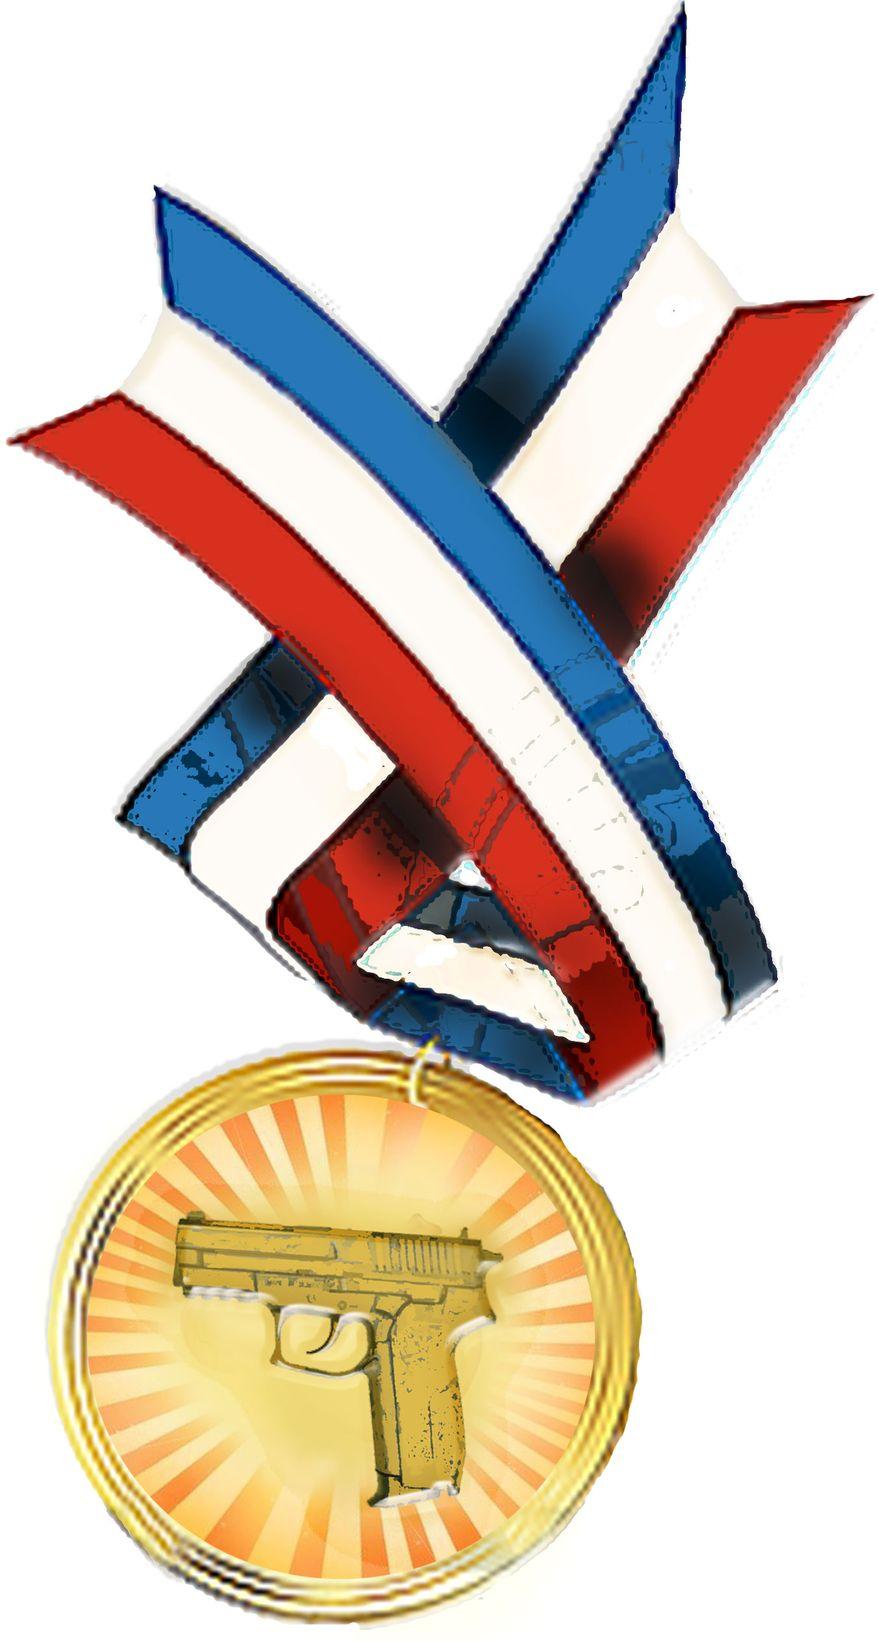 Illustration Gun Medal by John Camejo for The Washington Times